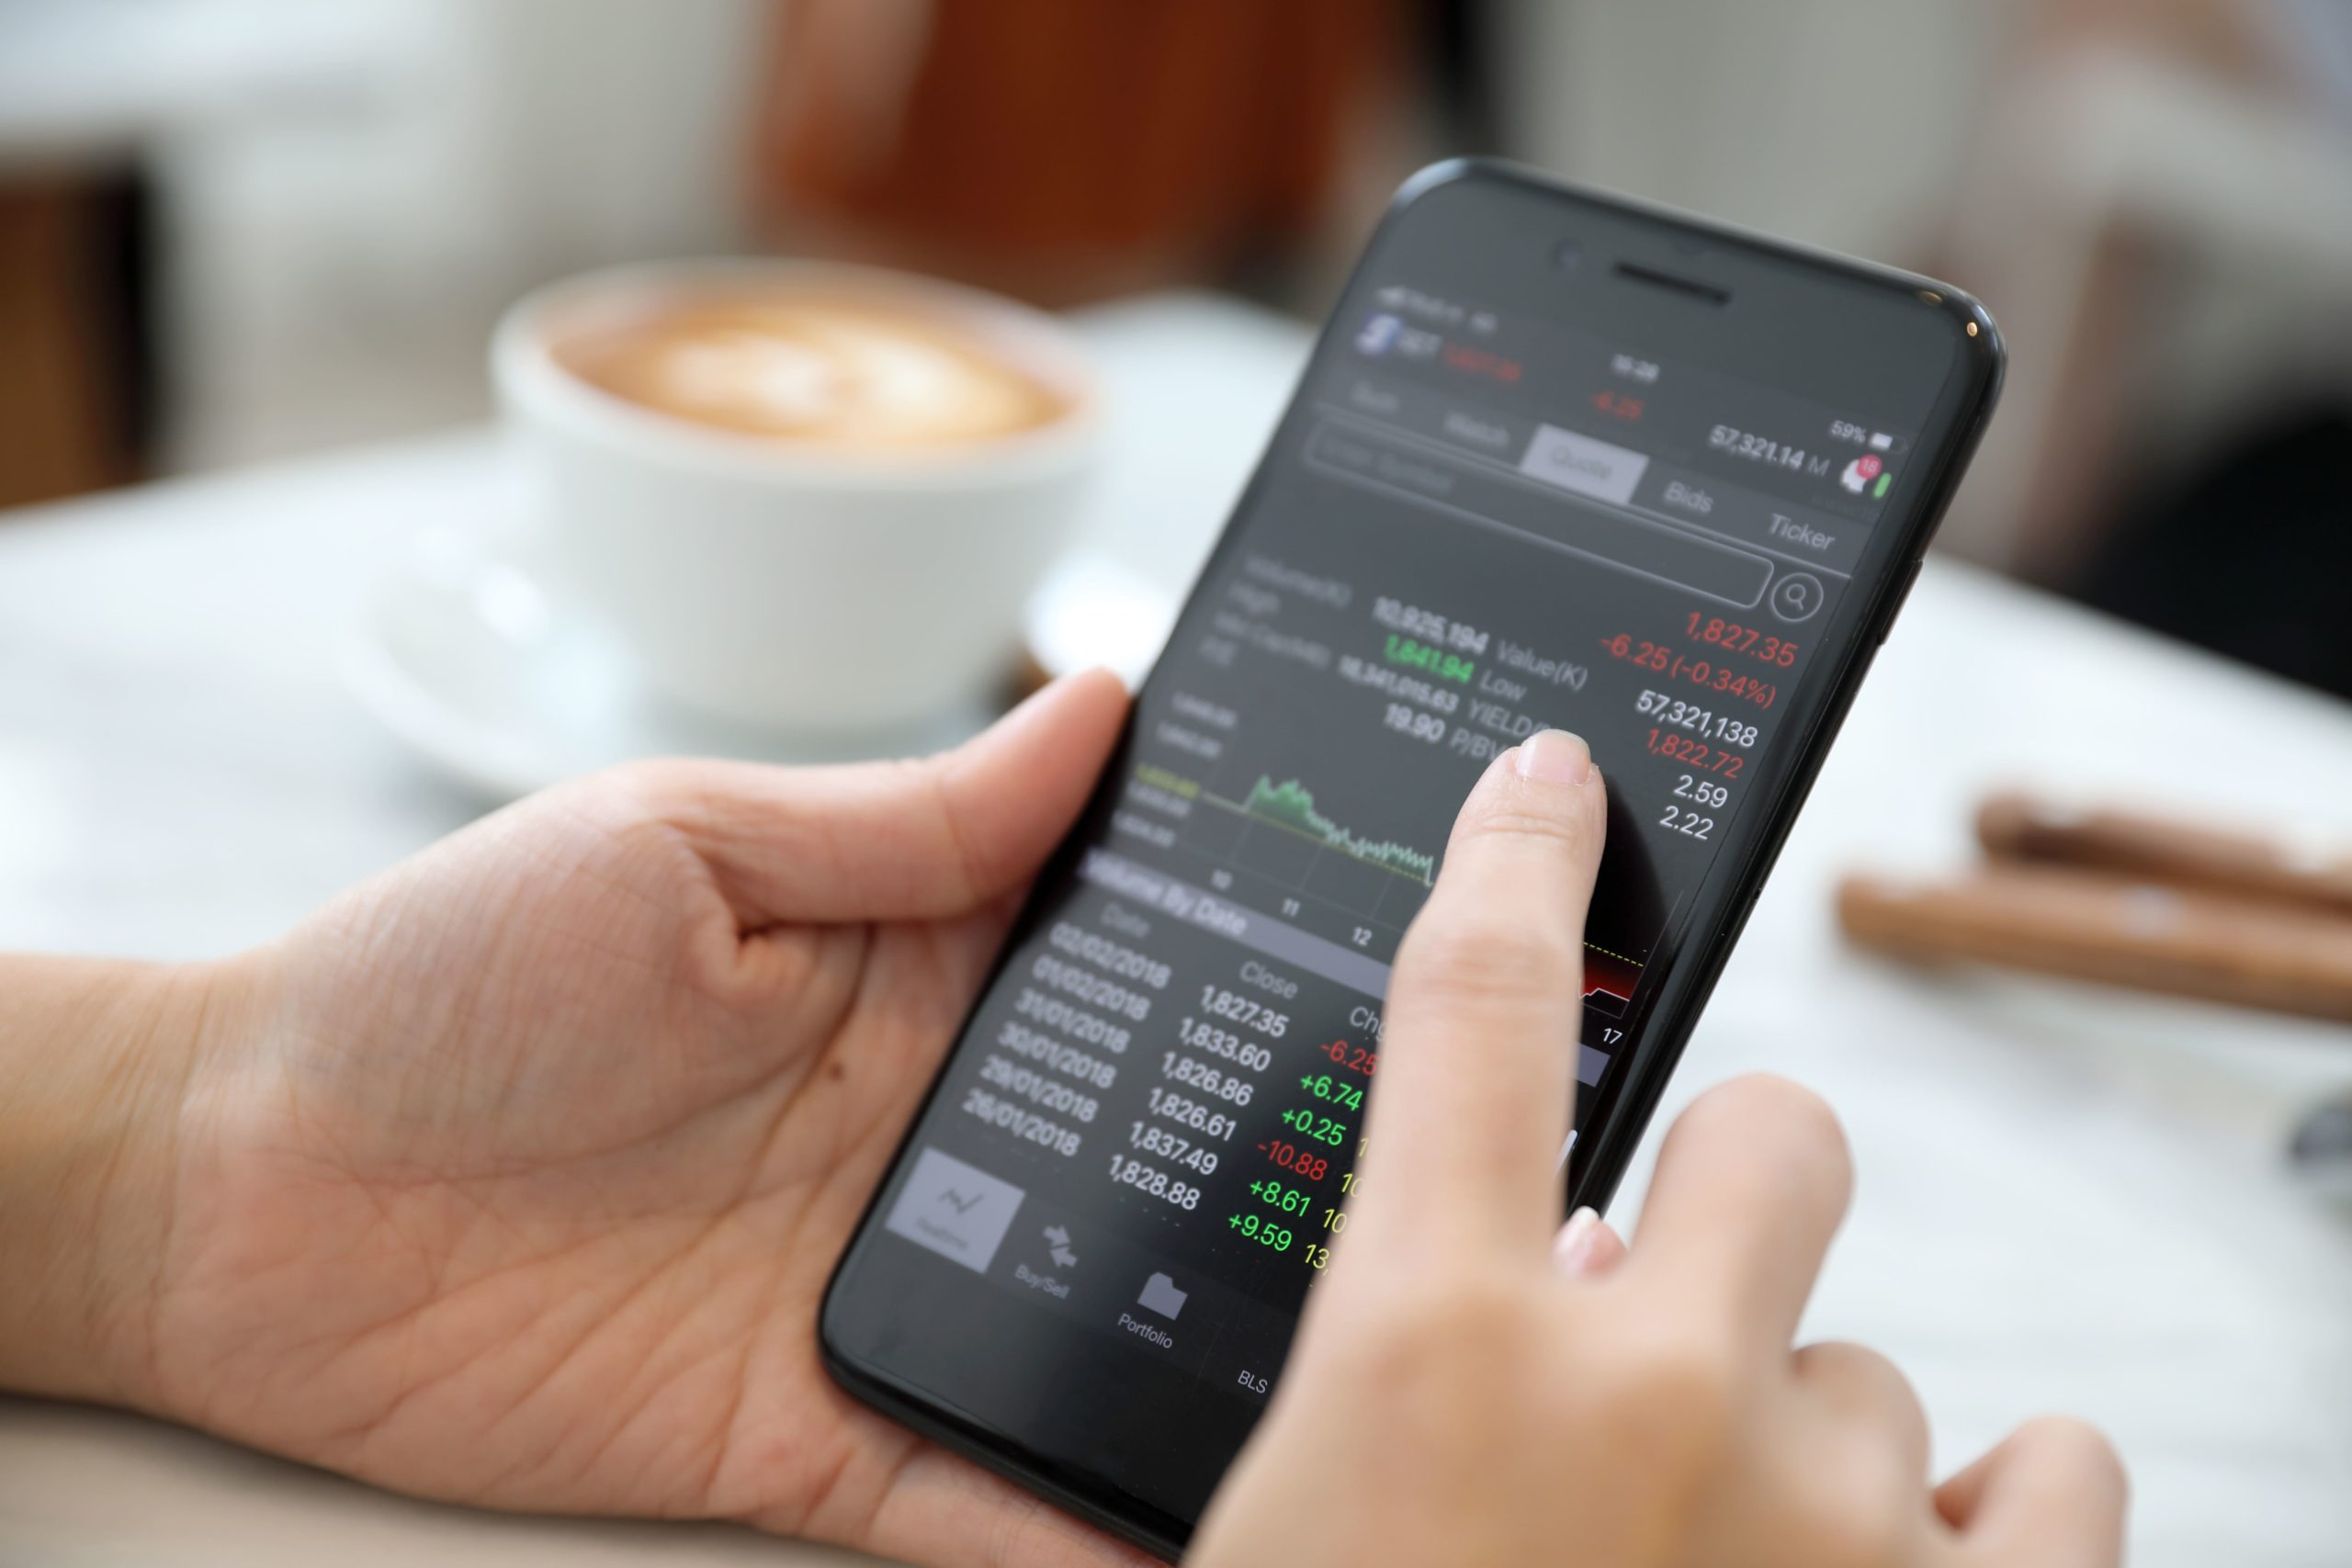 Auto trading Expert advisor